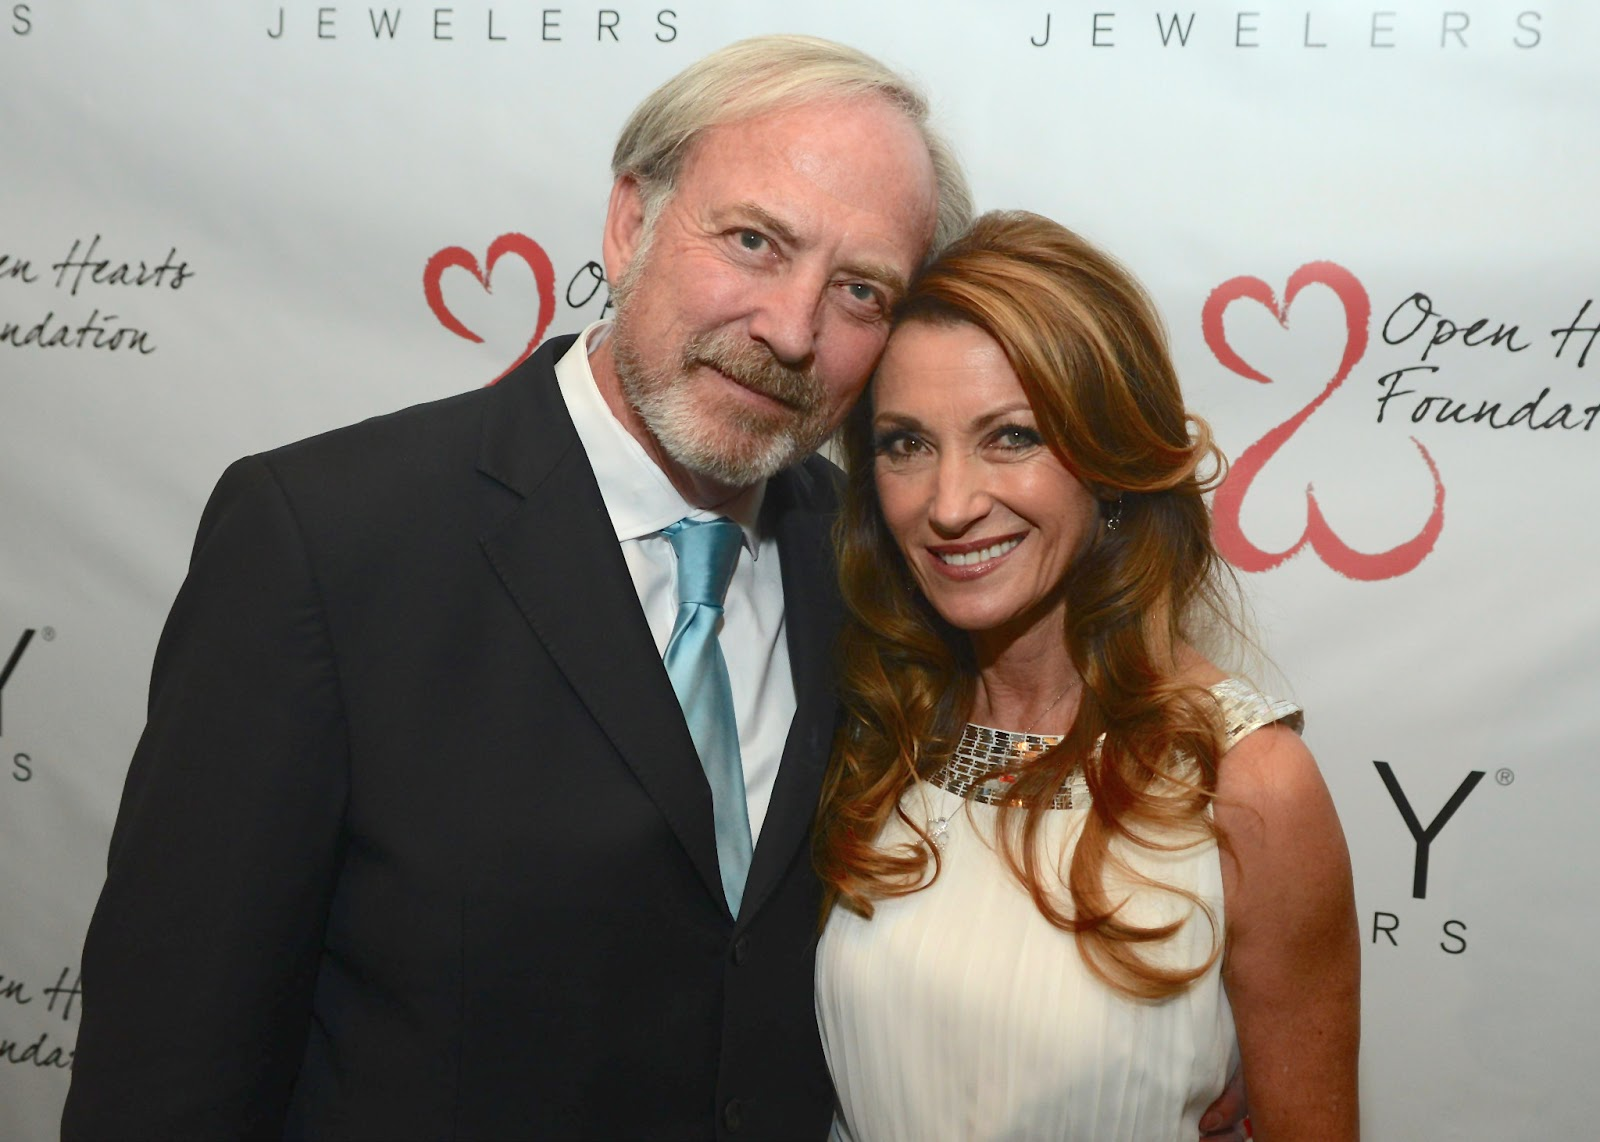 http://2.bp.blogspot.com/-OvHKuGgn4h4/UWmdtX4BqdI/AAAAAAAA62Y/Kbh2RhGuzMM/s1600/Jane-Seymour-divorce.jpg